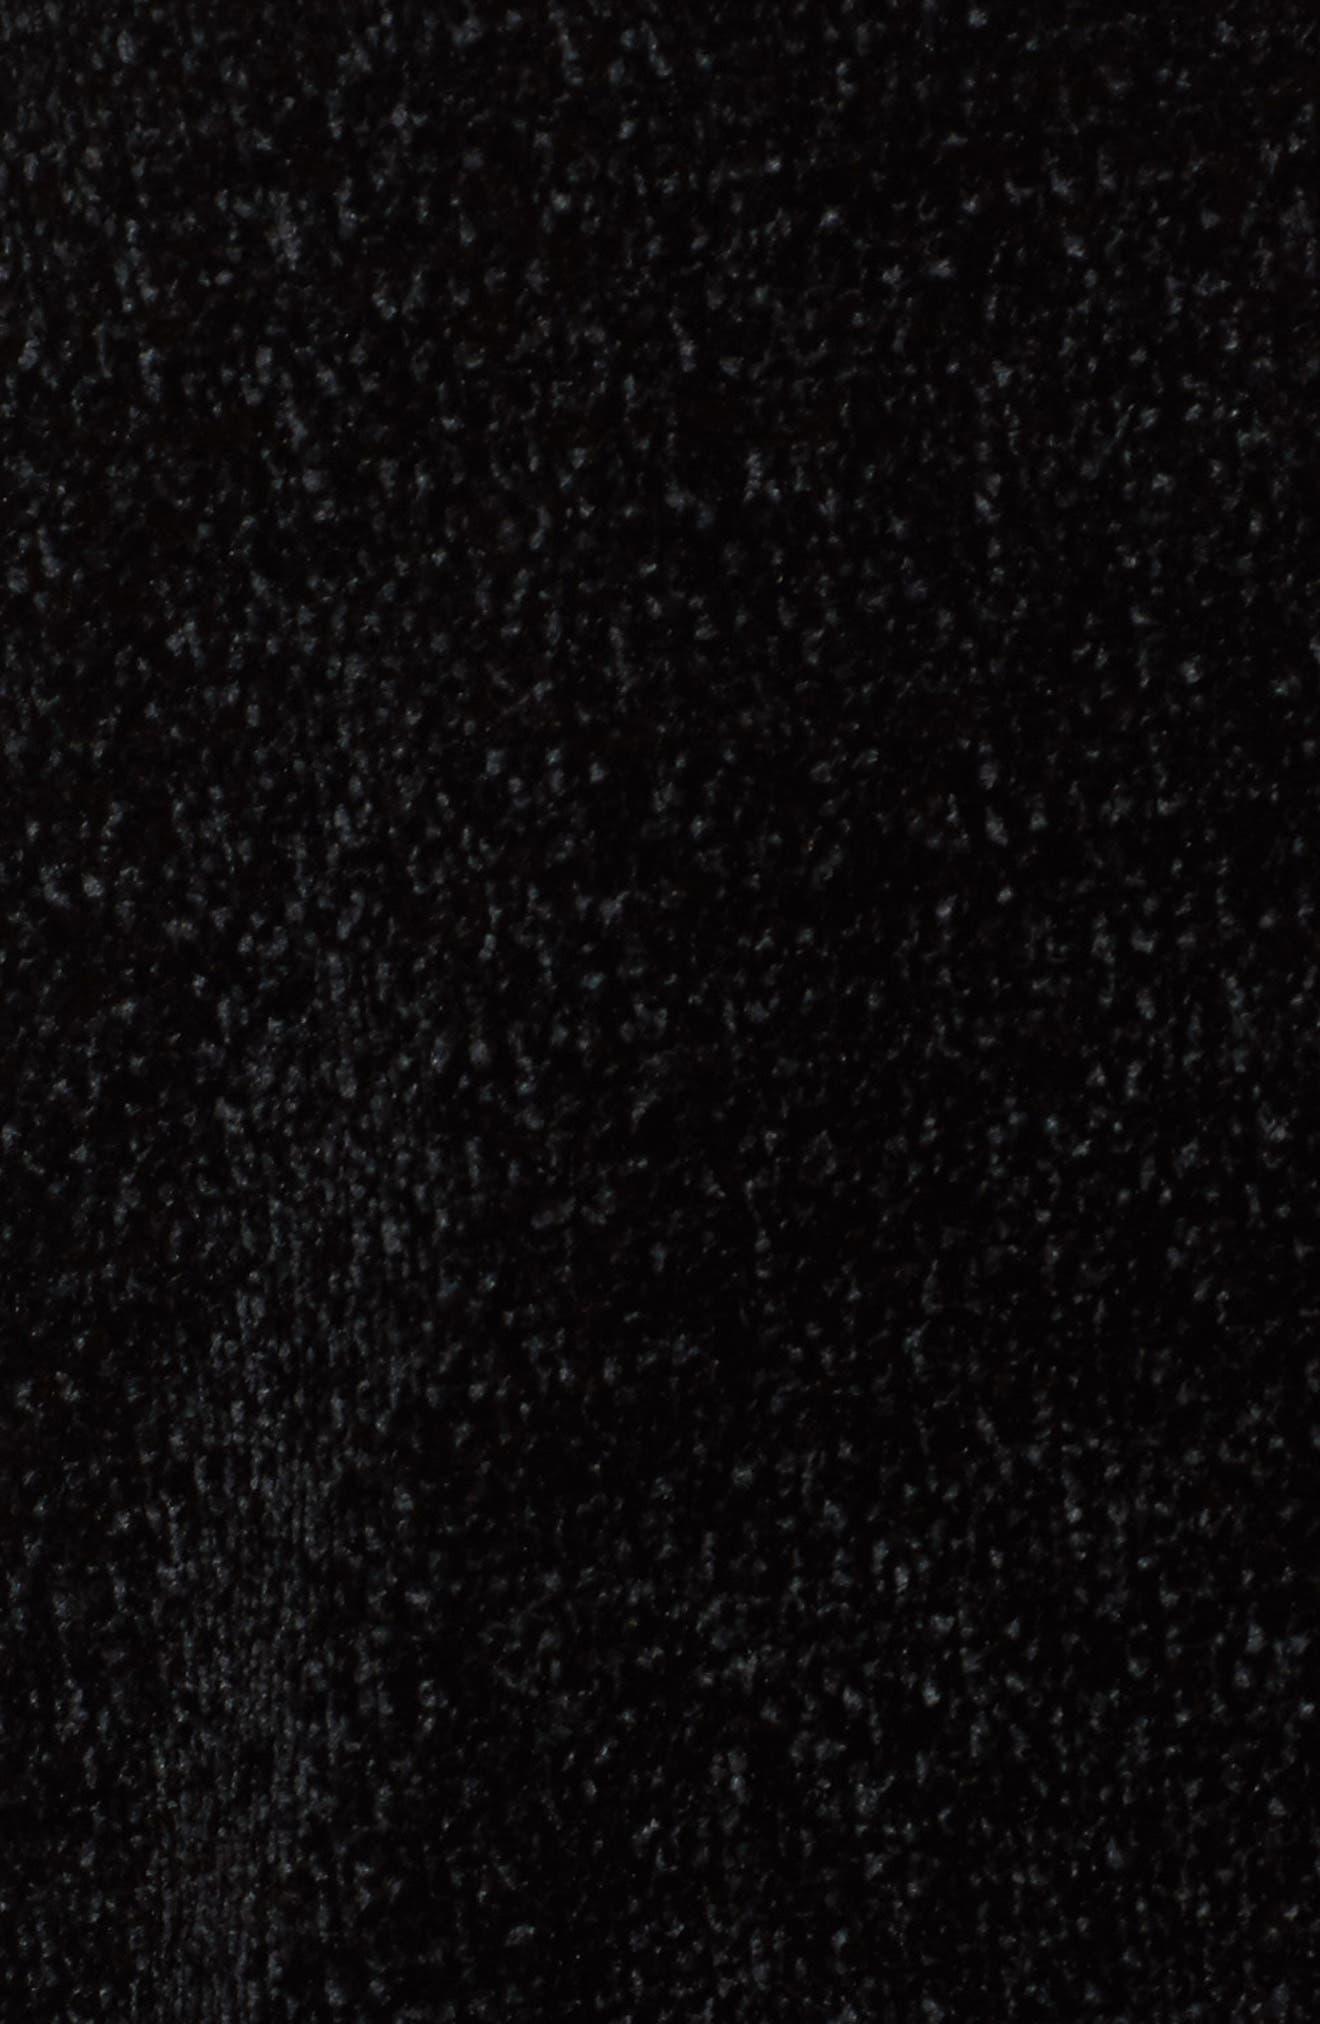 Oversize V-Neck Sweater,                             Alternate thumbnail 5, color,                             BLACK/ MED. HEATHER GREY